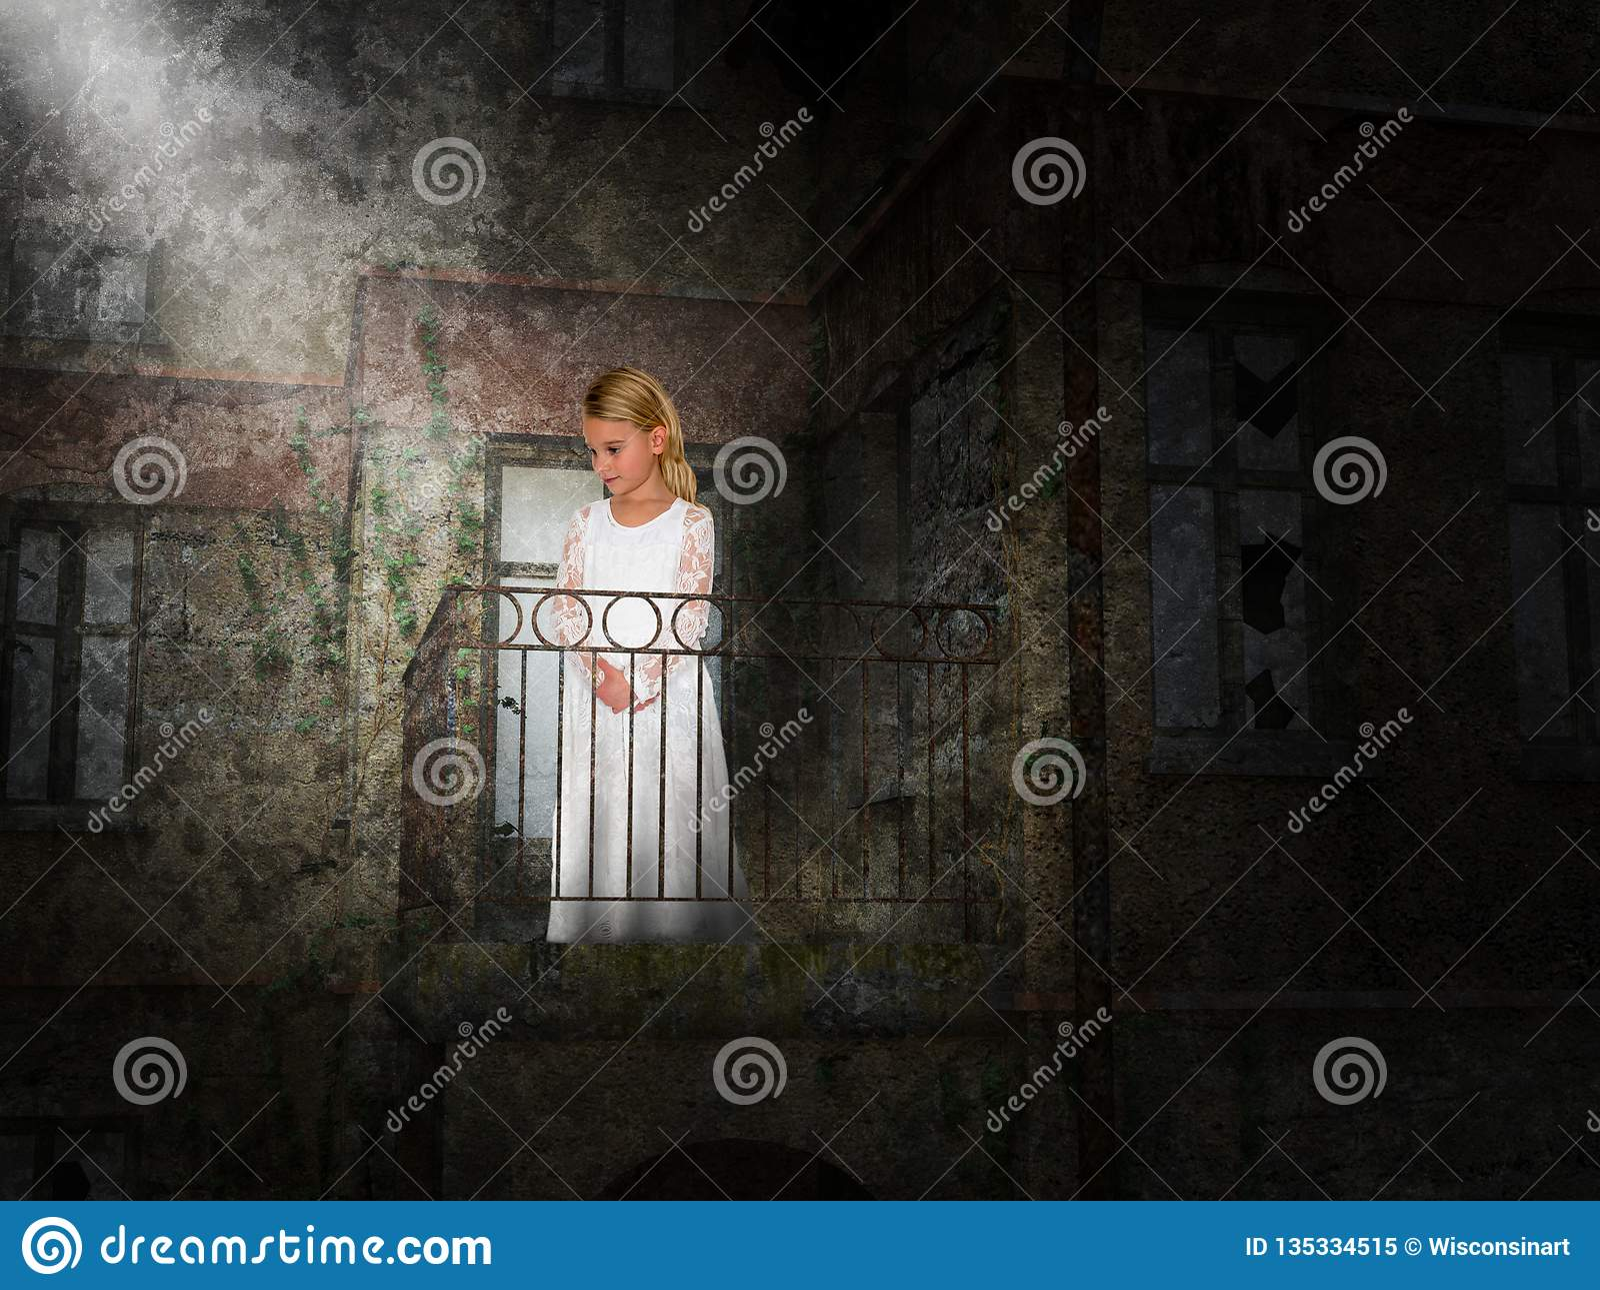 Chica joven, balcón, fantasía, imaginación